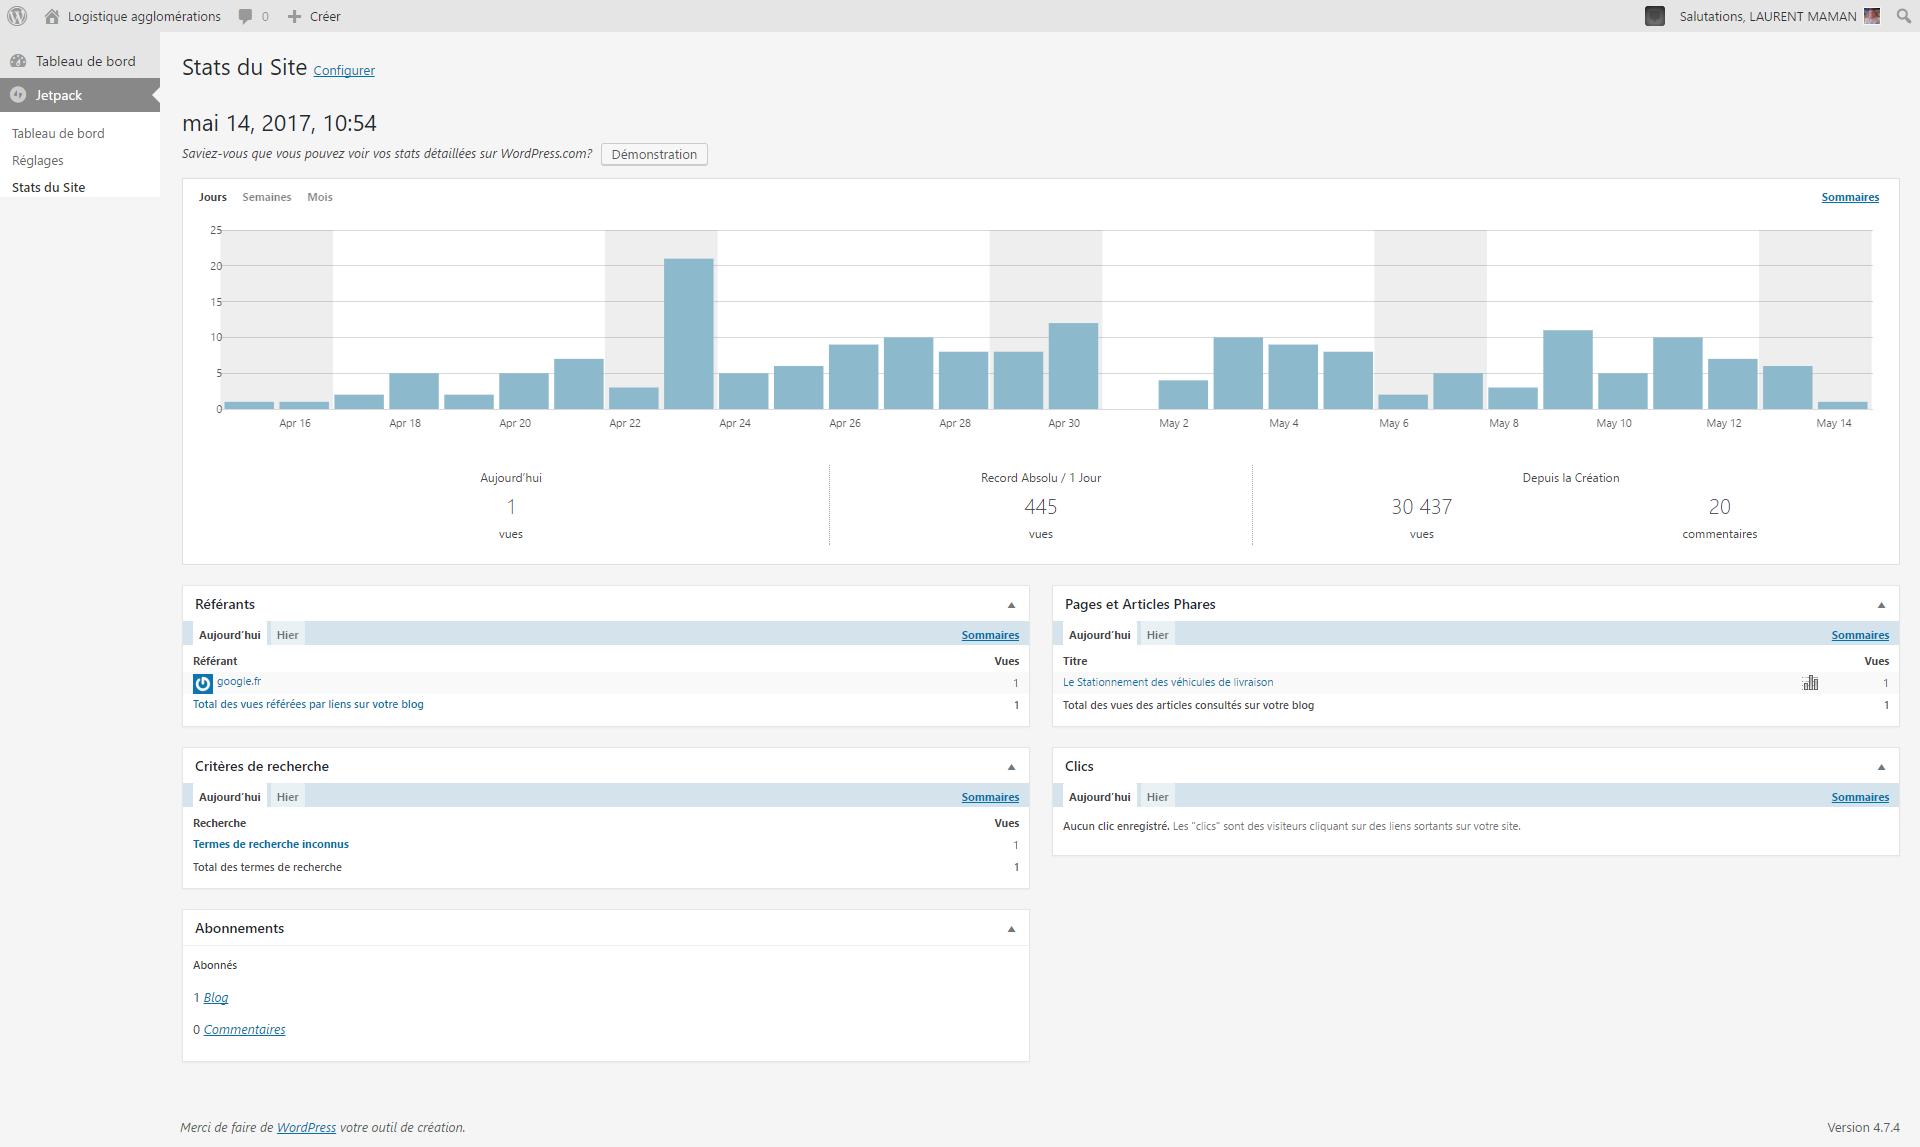 FireShot Capture 7 - Stats du Site ‹ Logistique agg_ - http___logistique-agglo.fr_wp-admin_admin.php